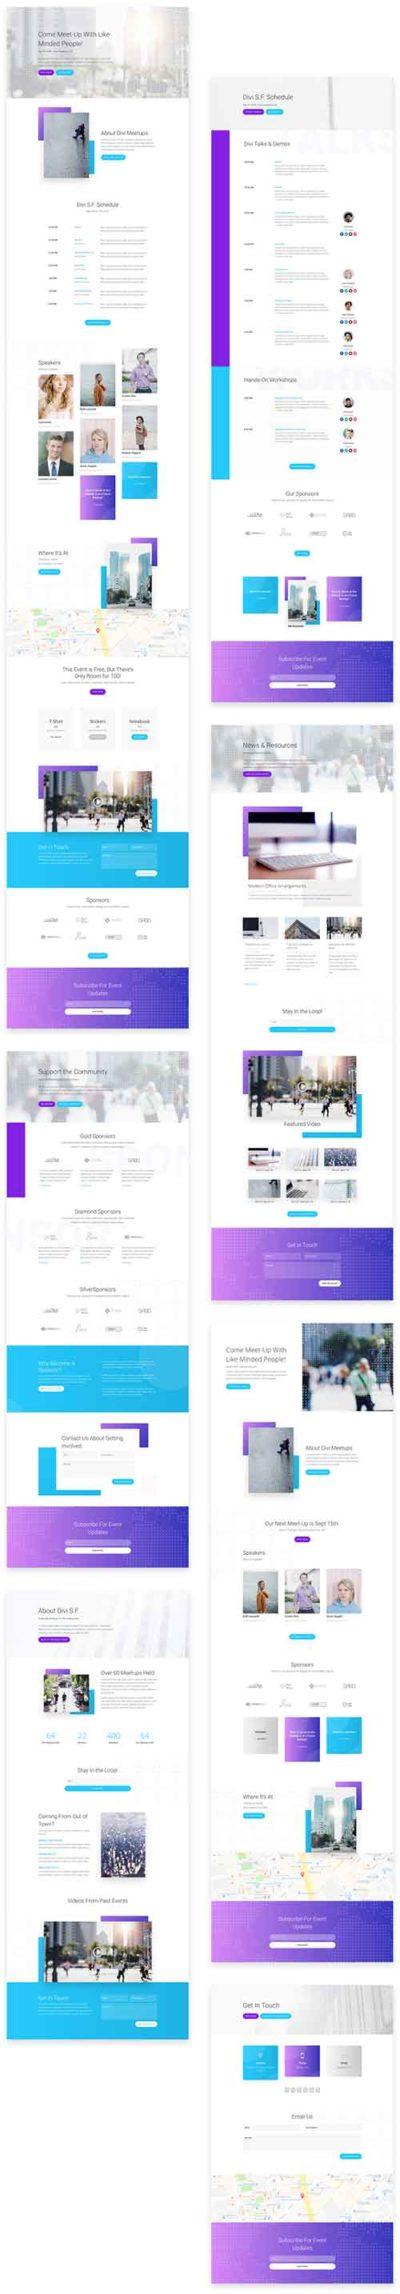 Divi meetup layout pack